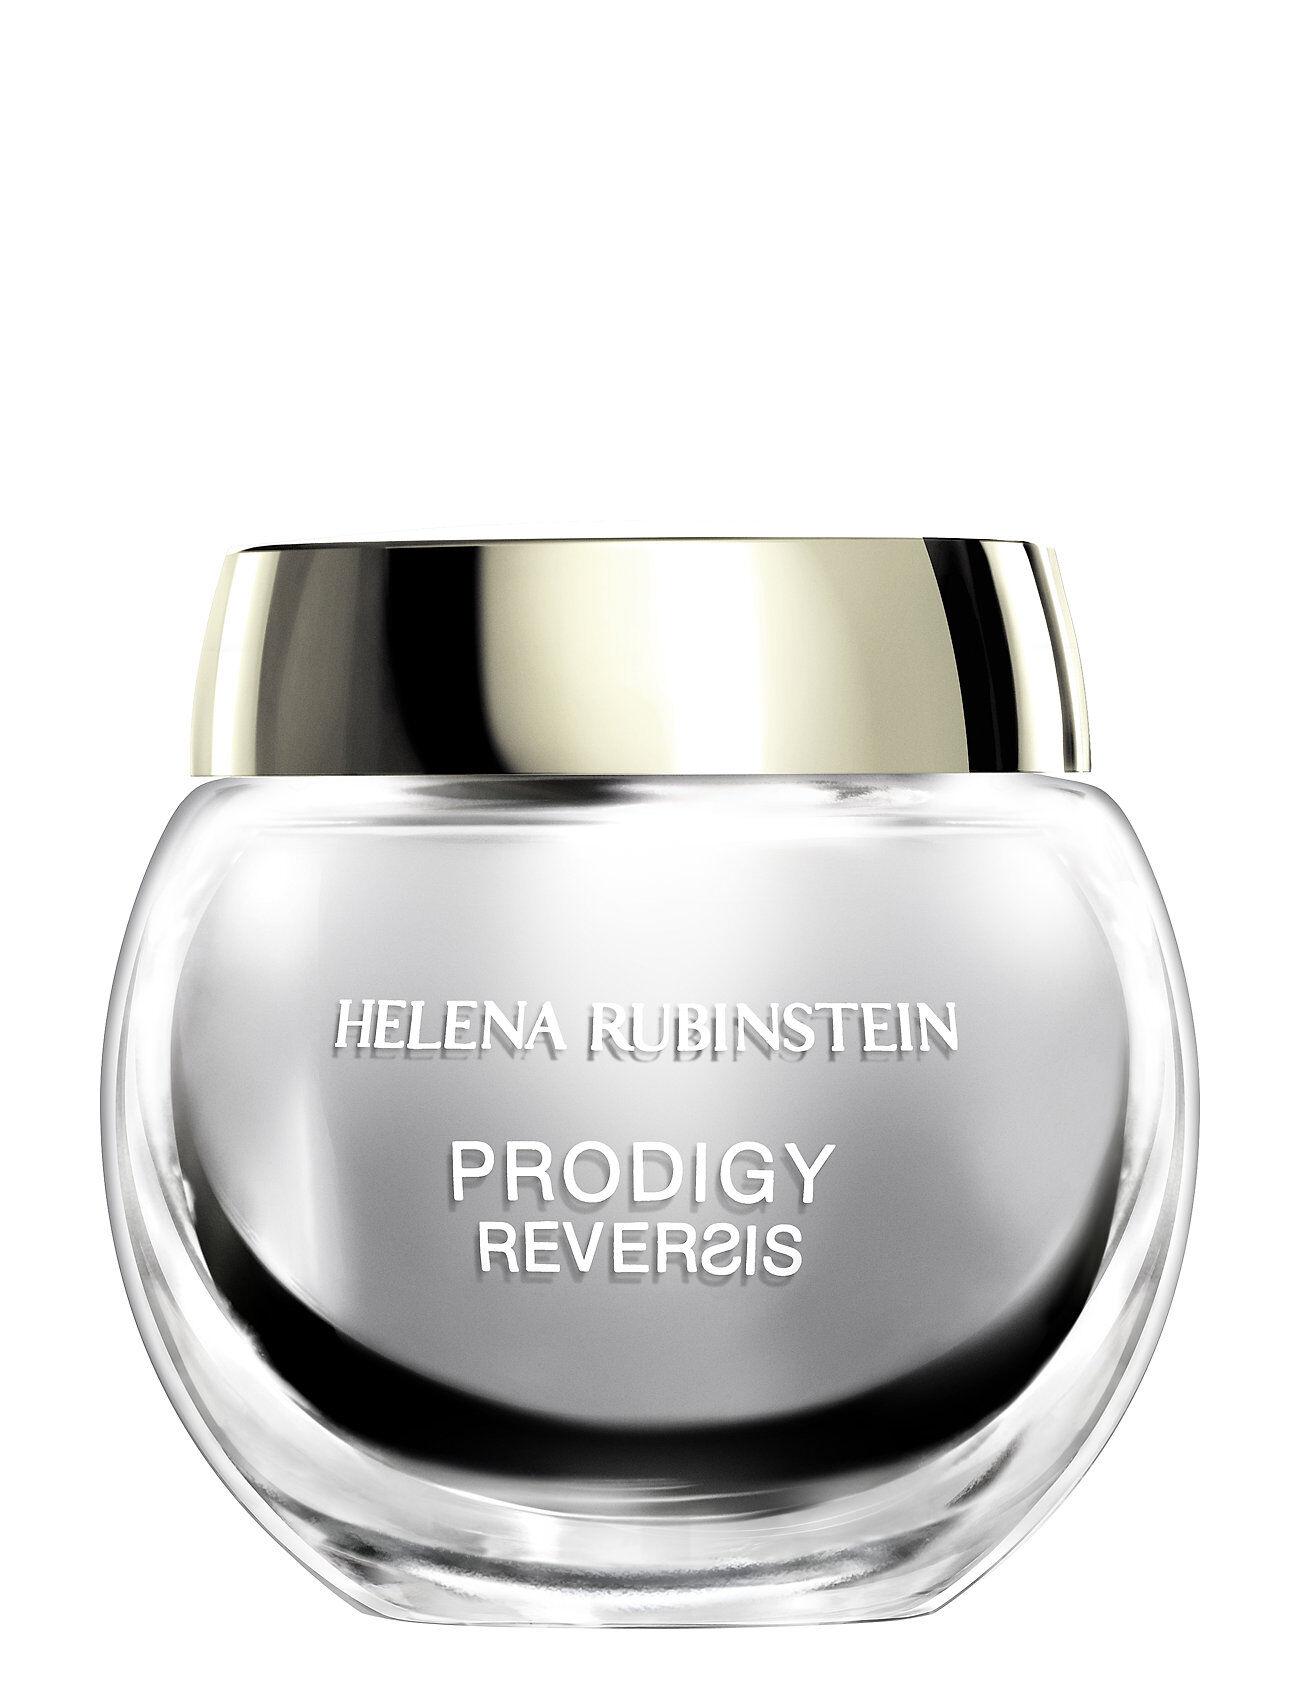 Helena Rubinstein Prodigy Reversis Creme Dry Skin 50 Ml